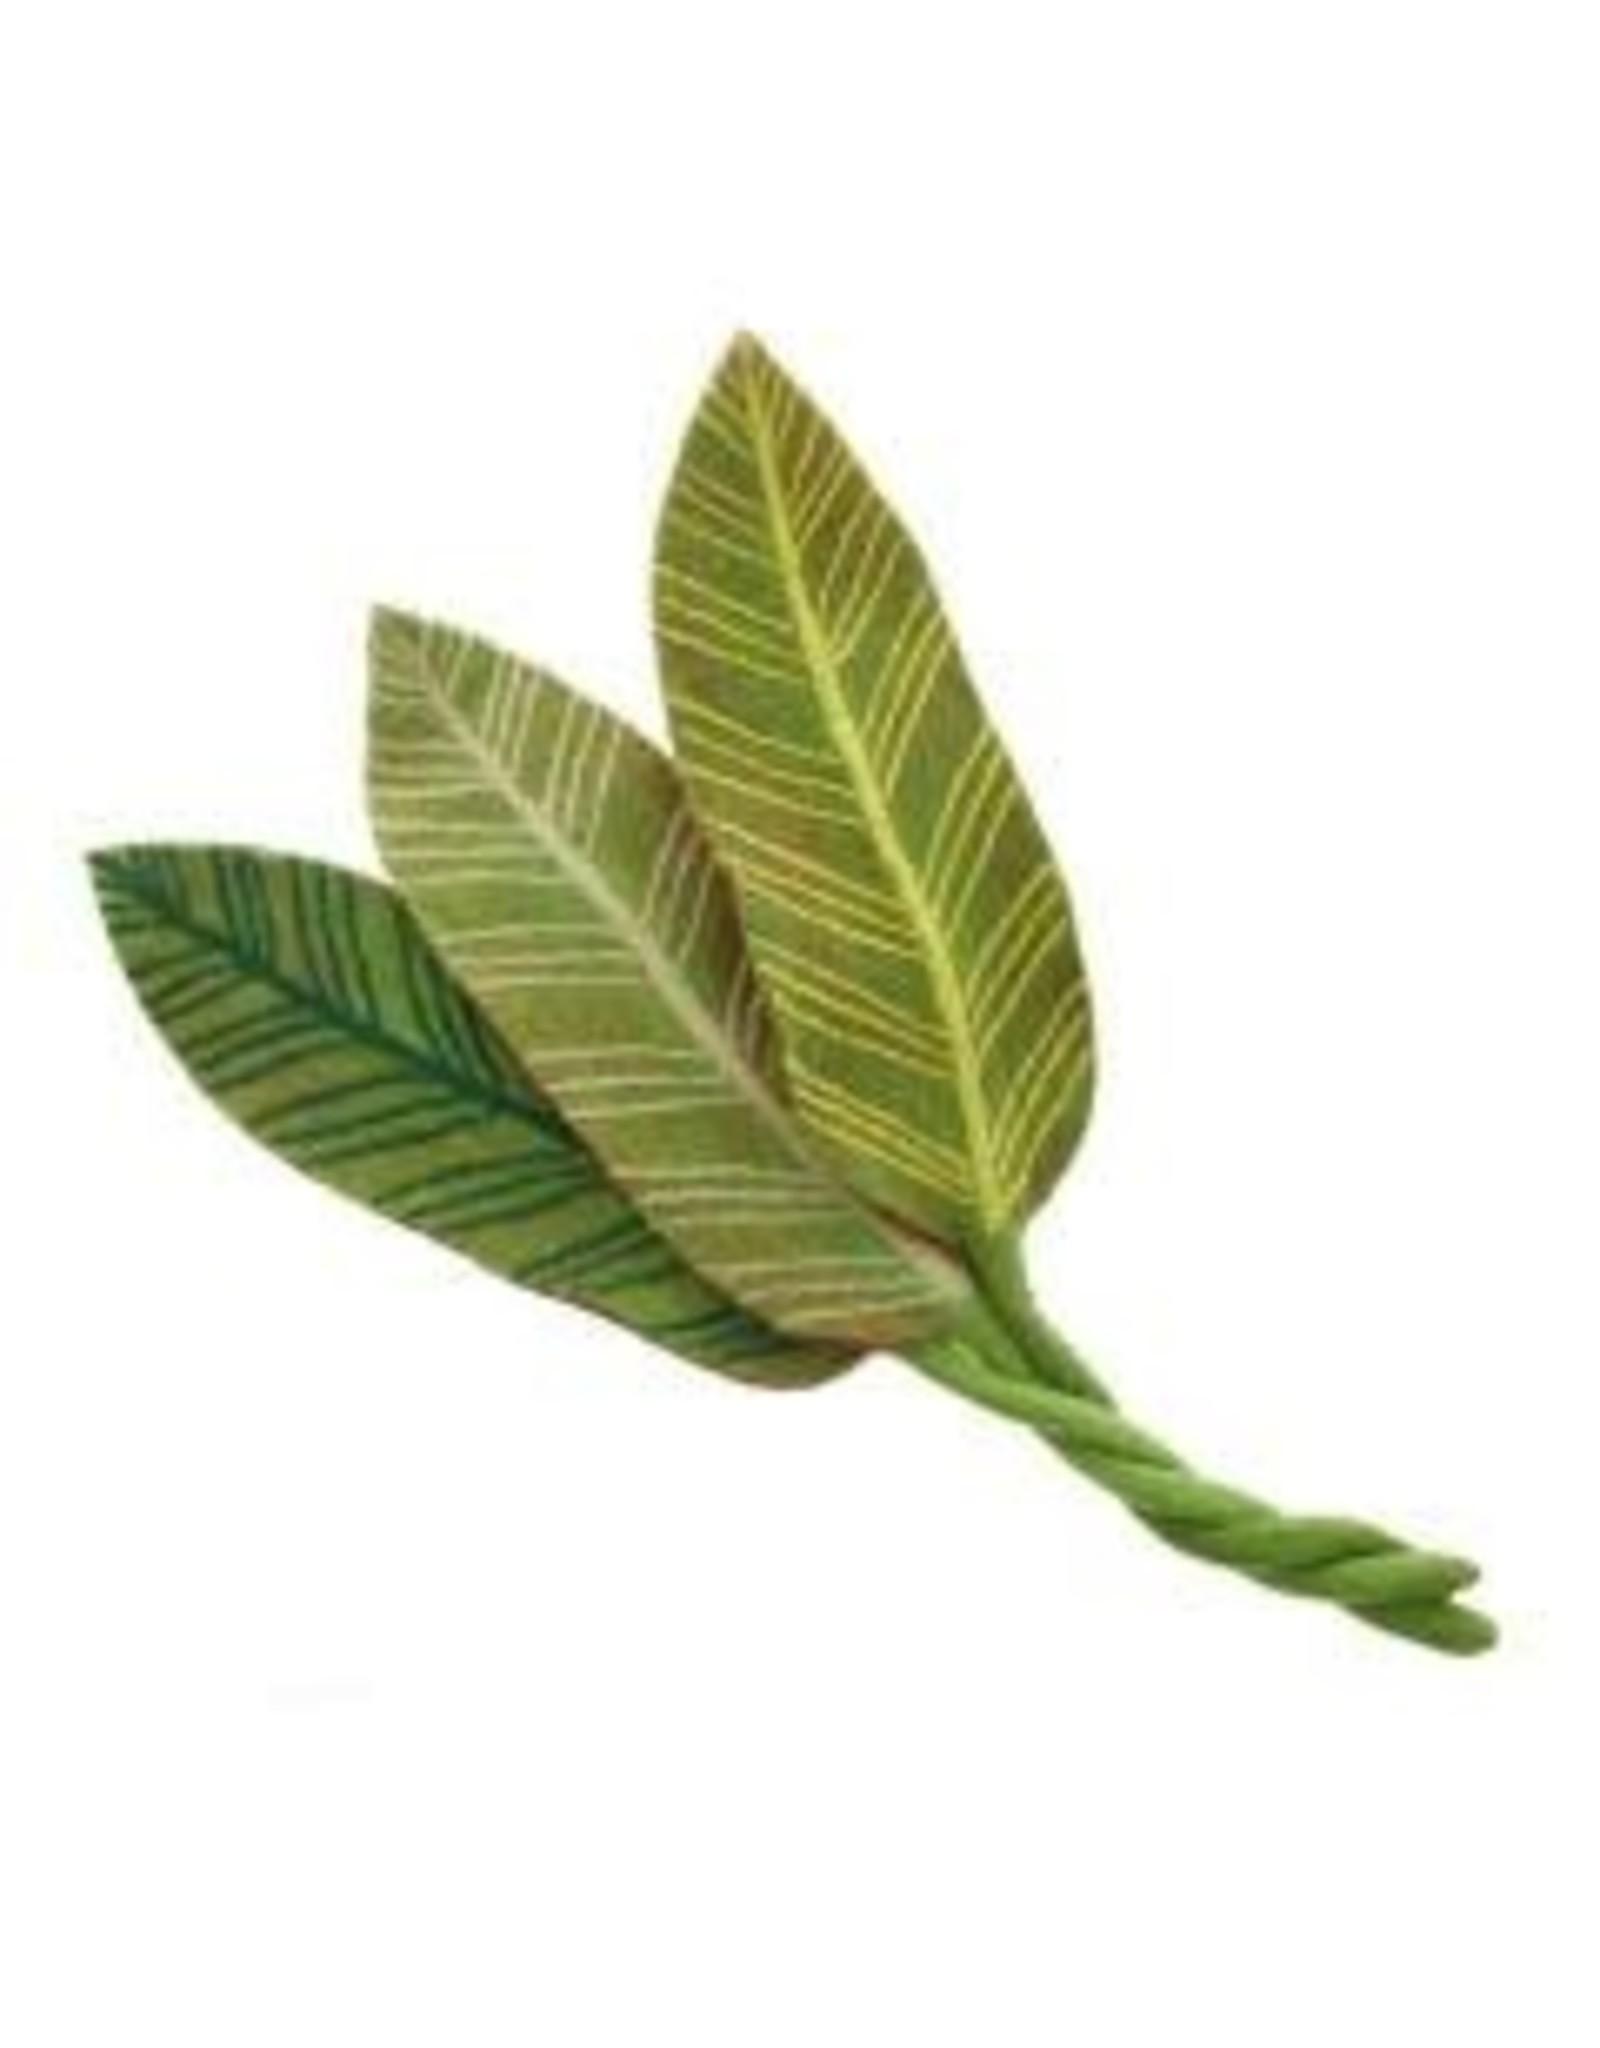 Felt Calathea Leaf White Veins, Nepal